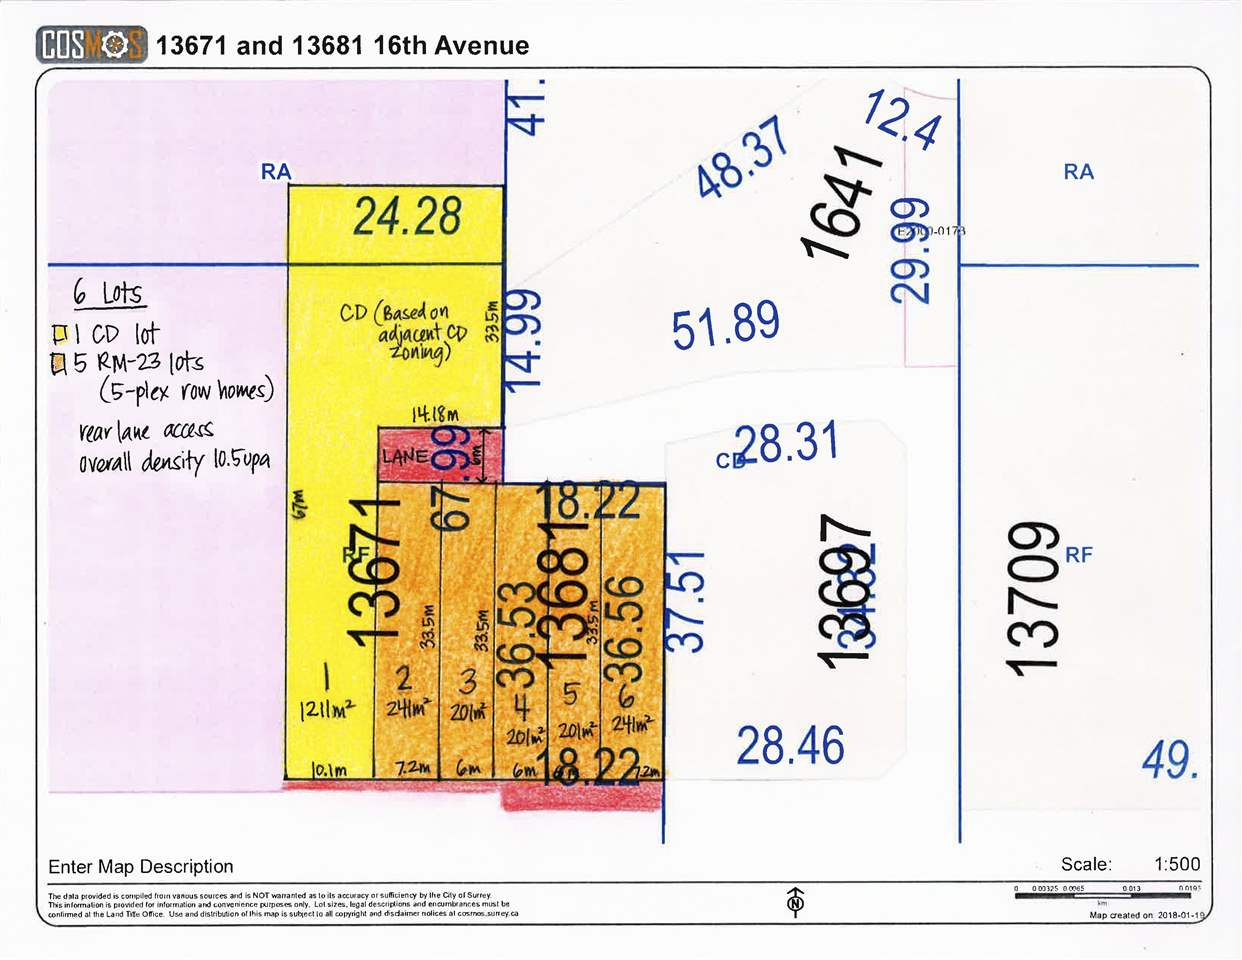 13671 16 AVENUE - MLS® # R2535923